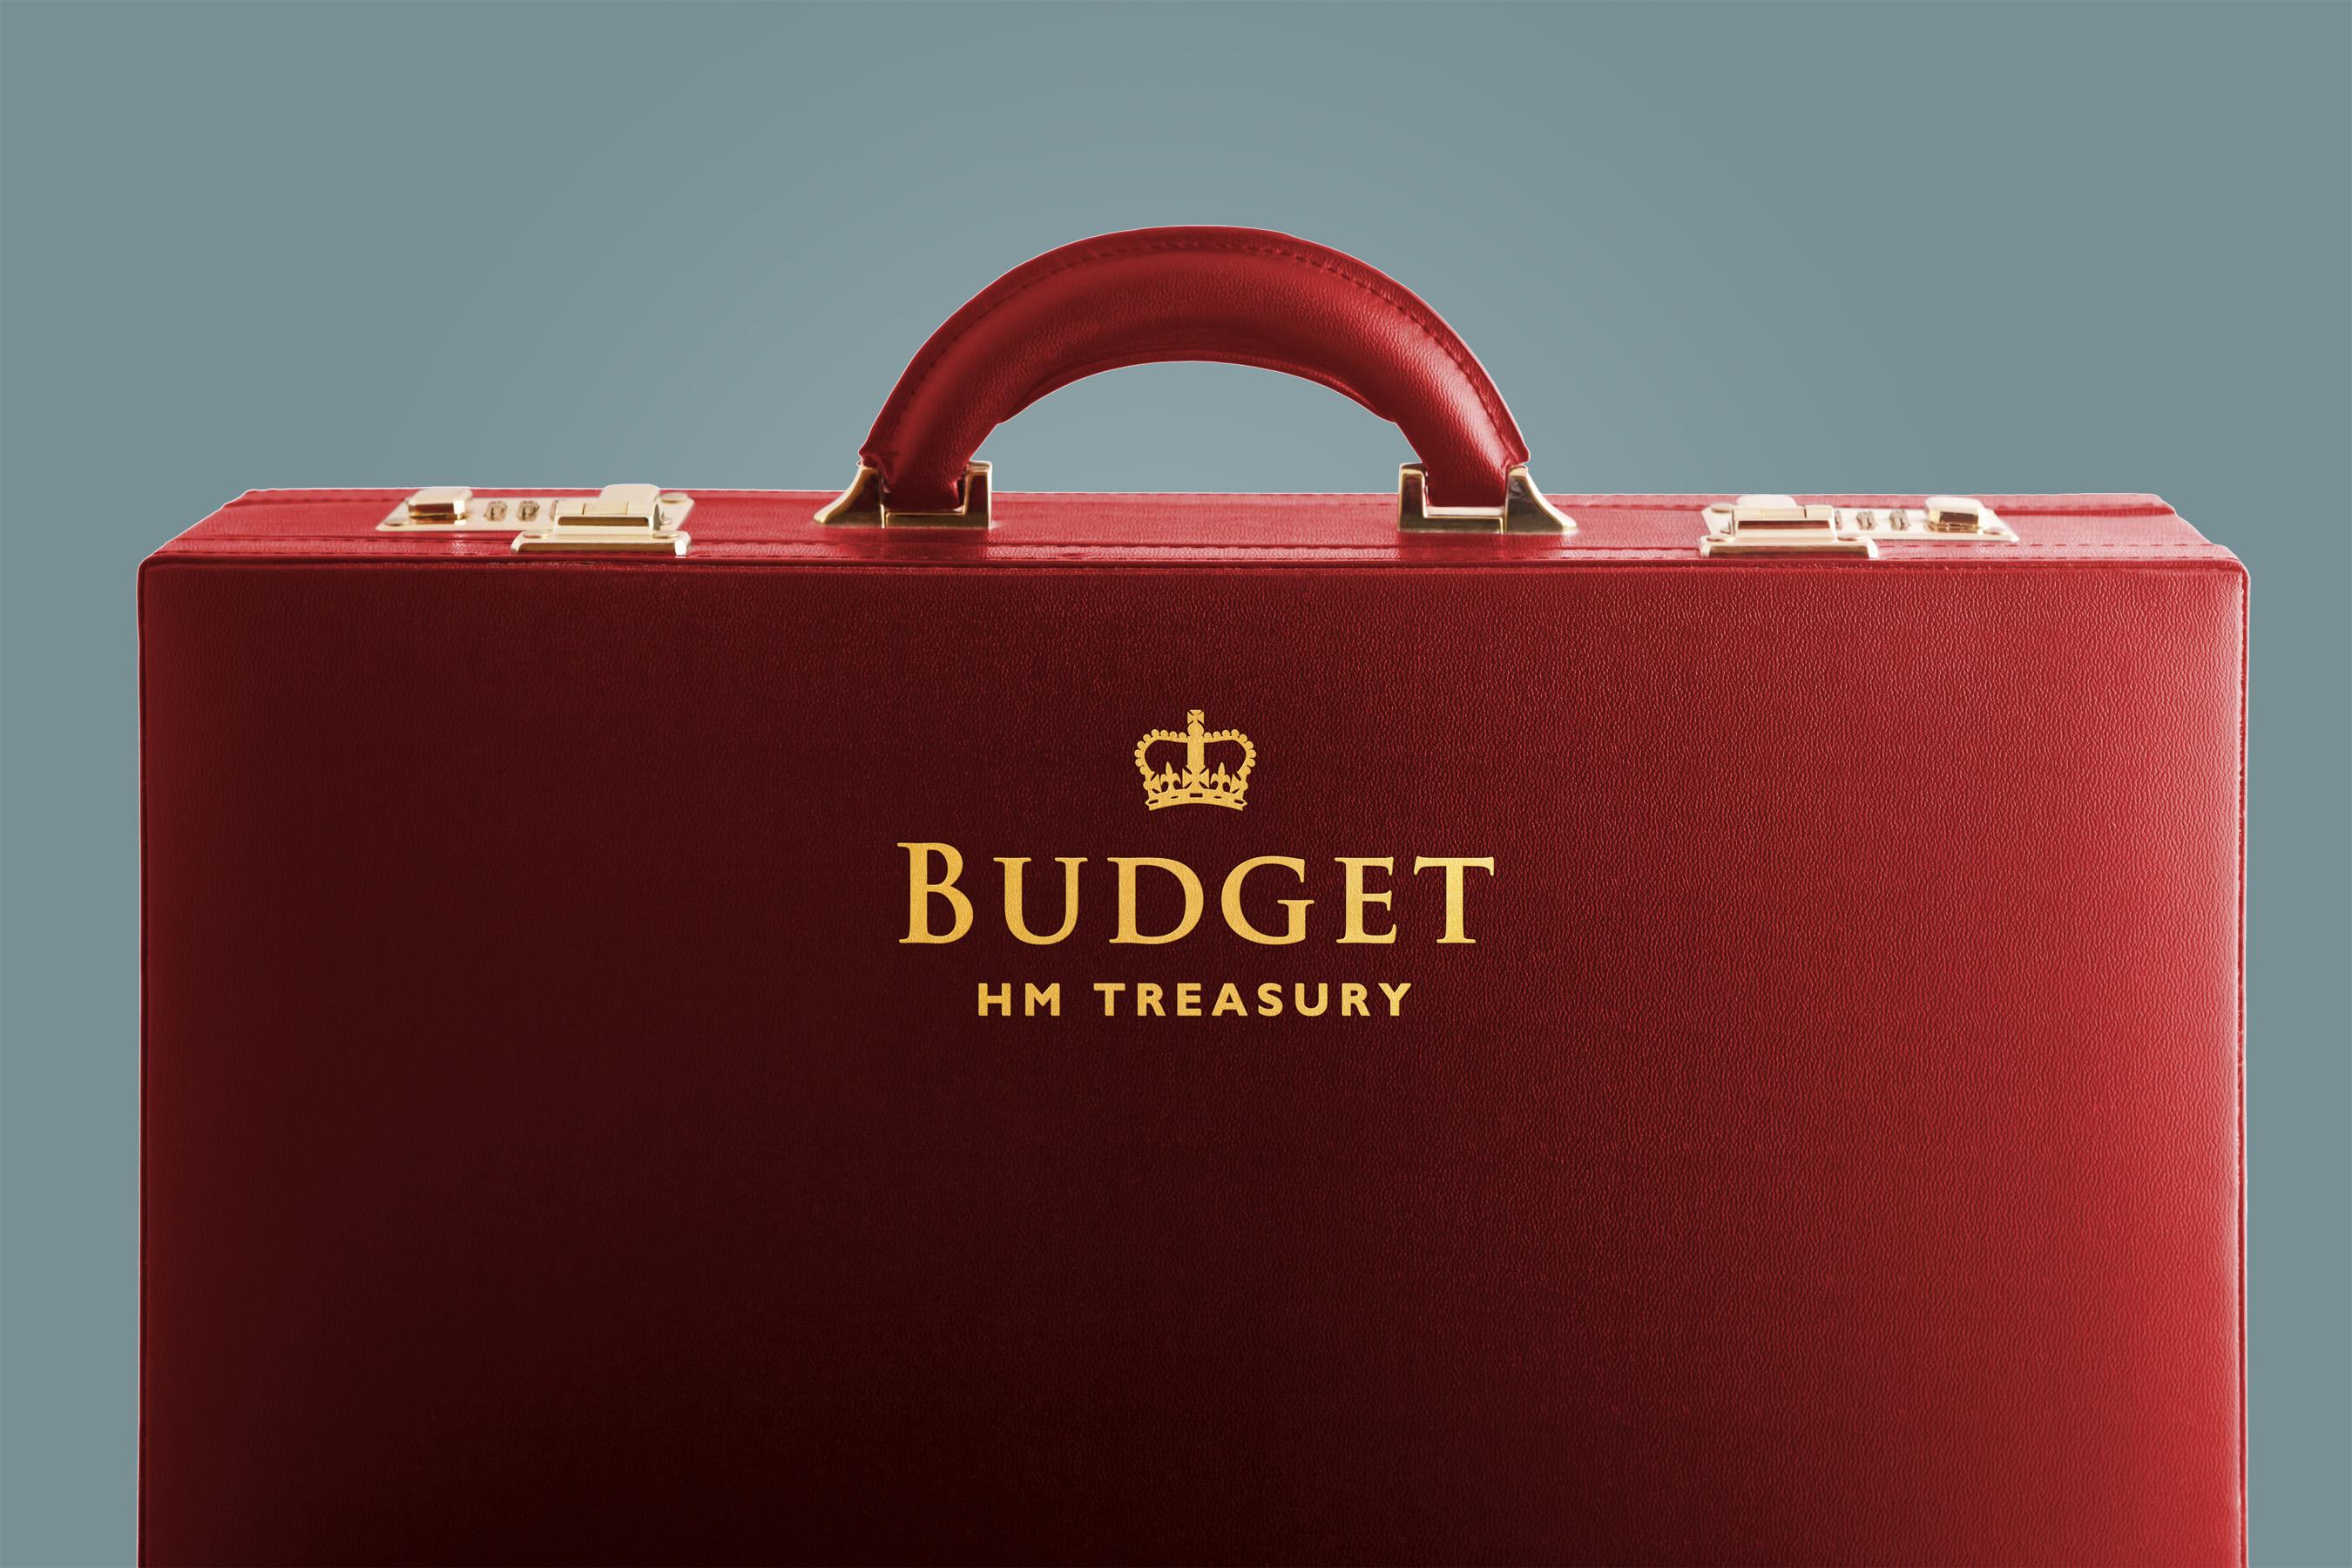 UK Treasury Budget briefcase